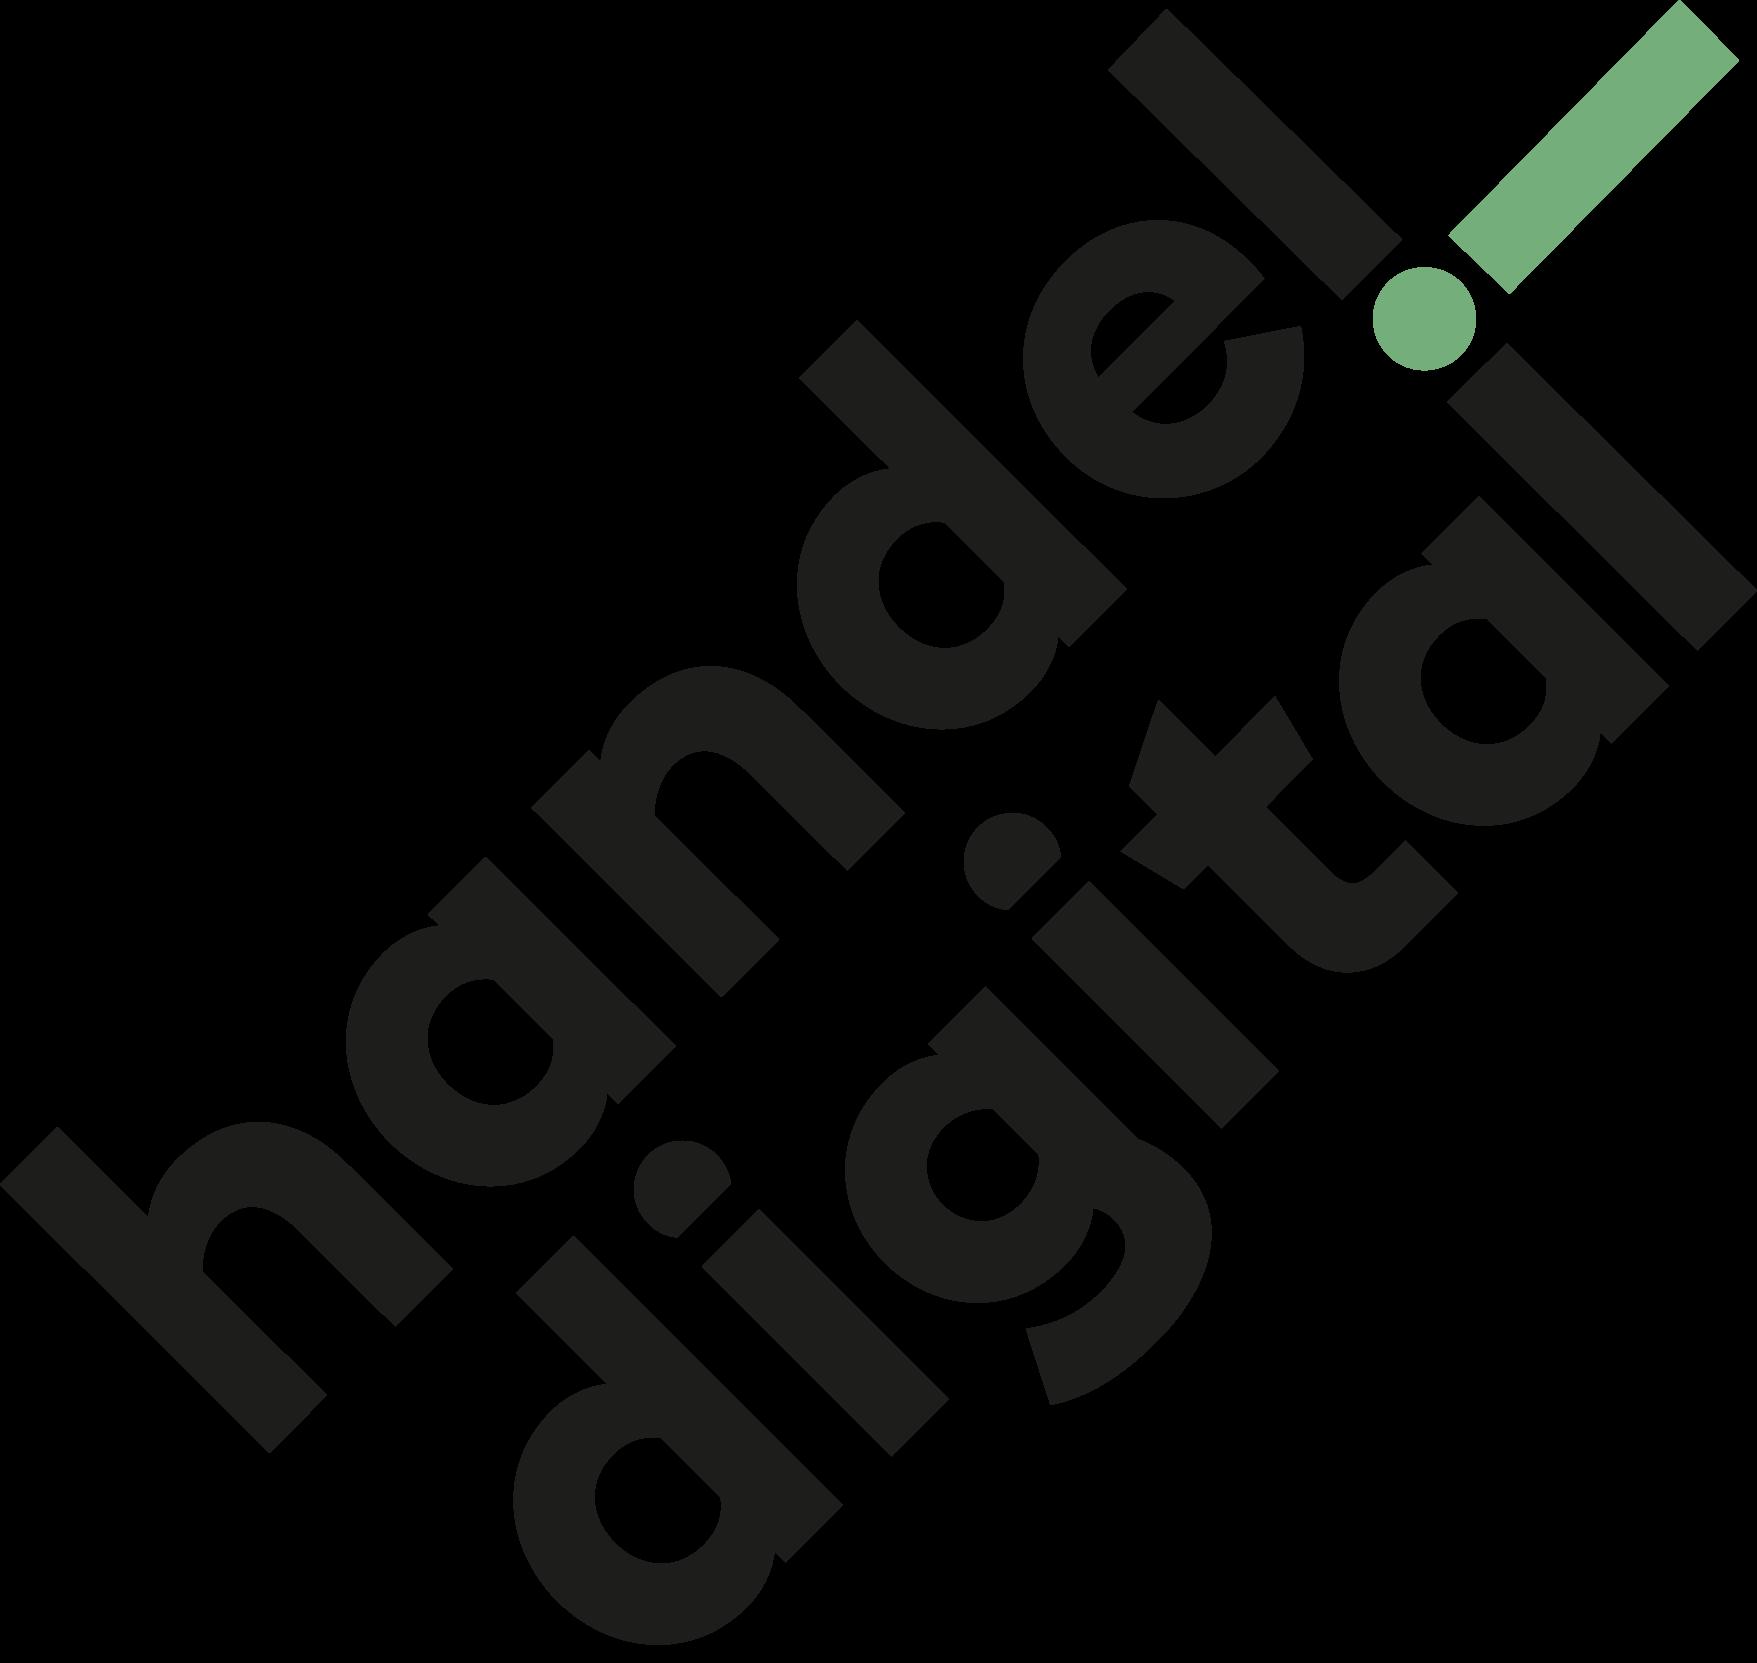 Handel Digital 3. Digi-Level der Digitalisierung